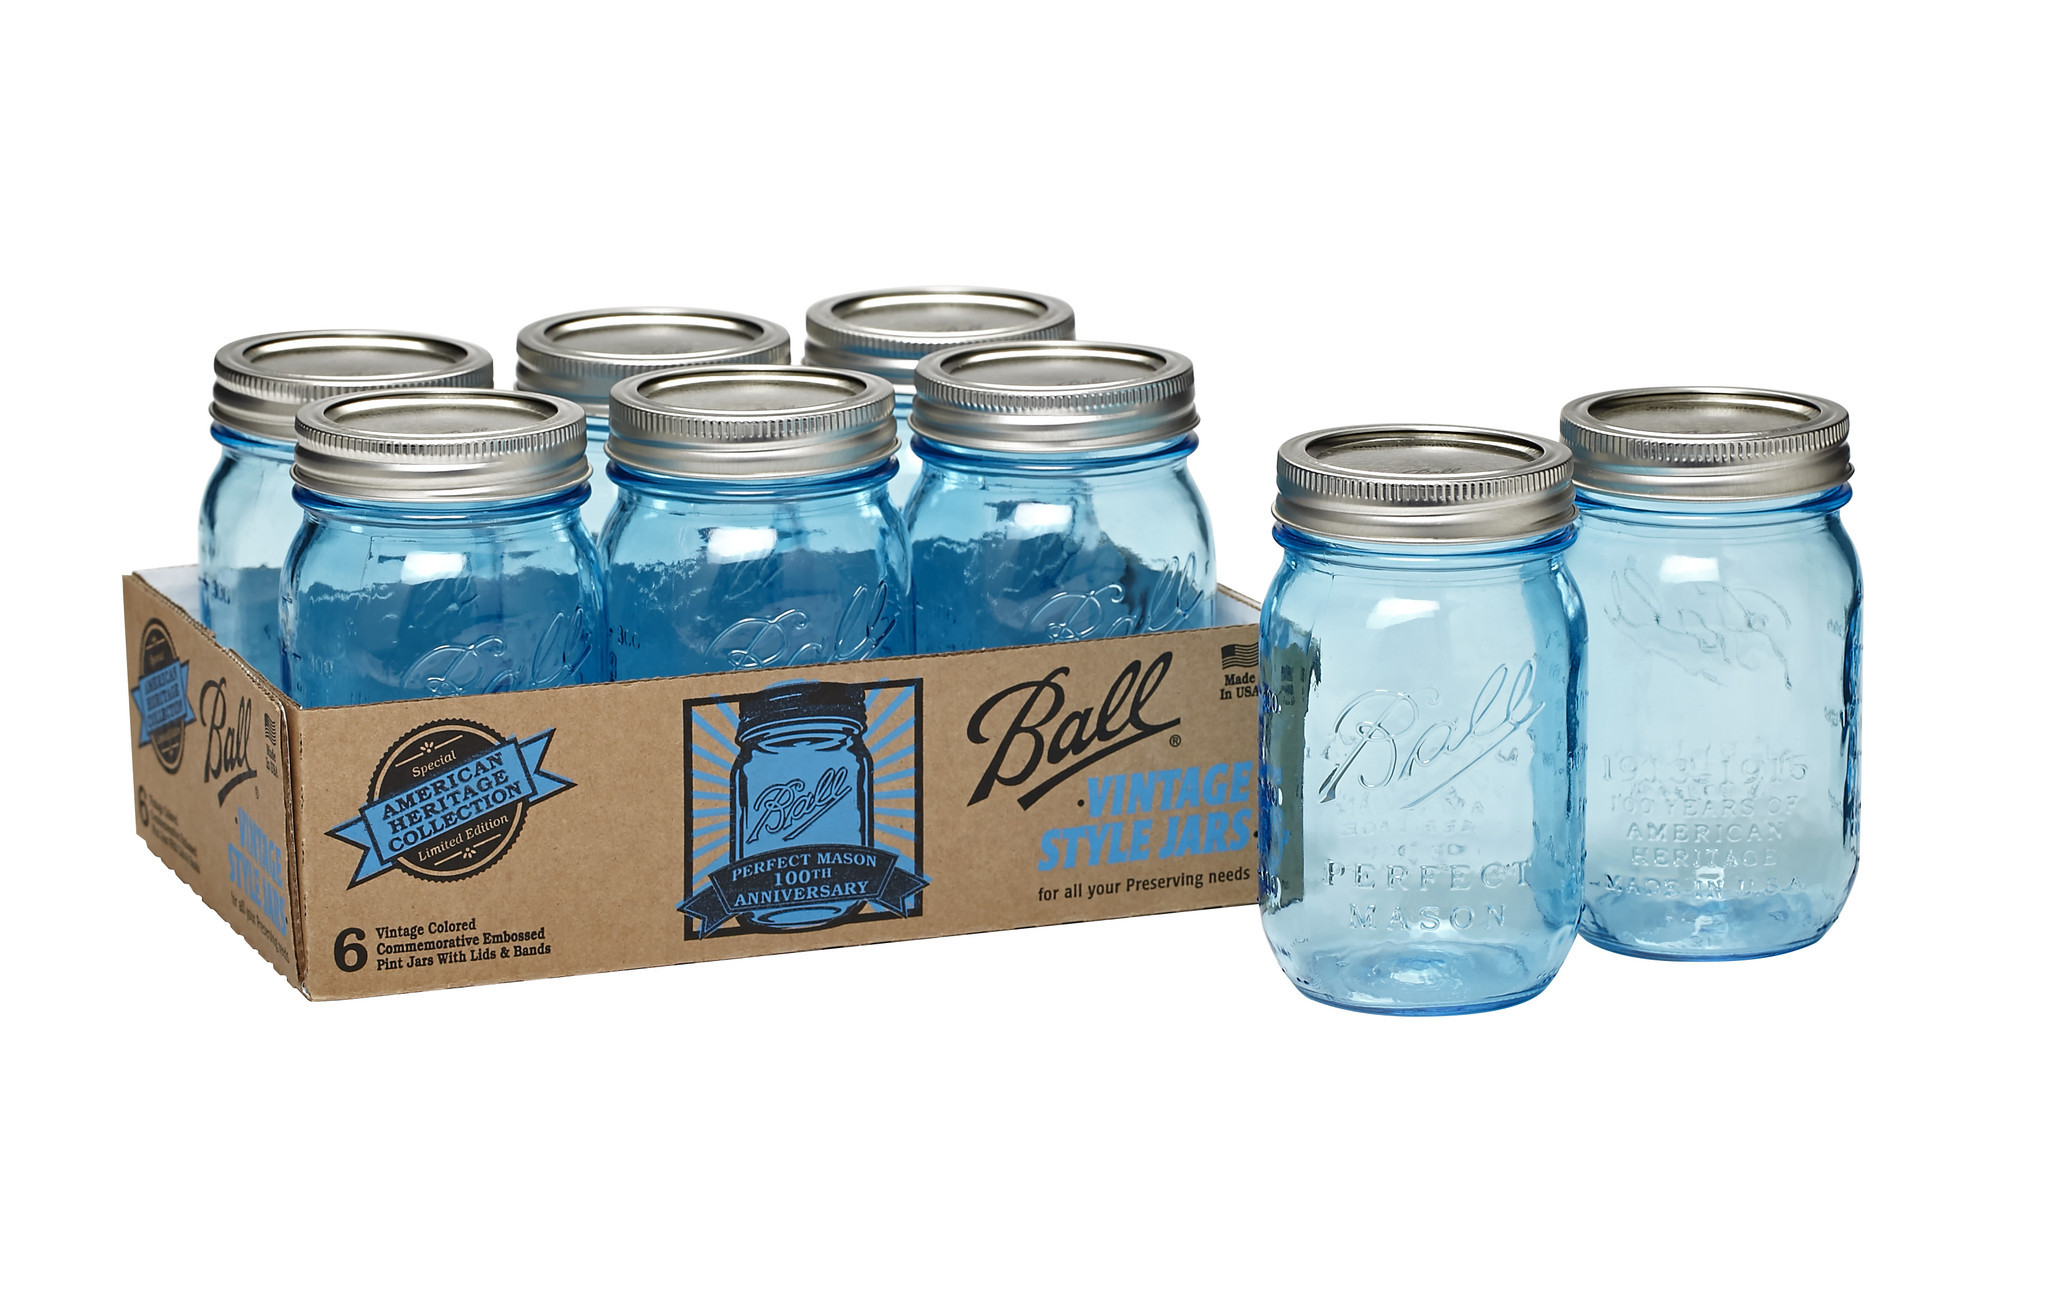 Ball Canning Jars 100th Anniversary Celebrates Clic Blue Look And Logo On Mason Daily Press